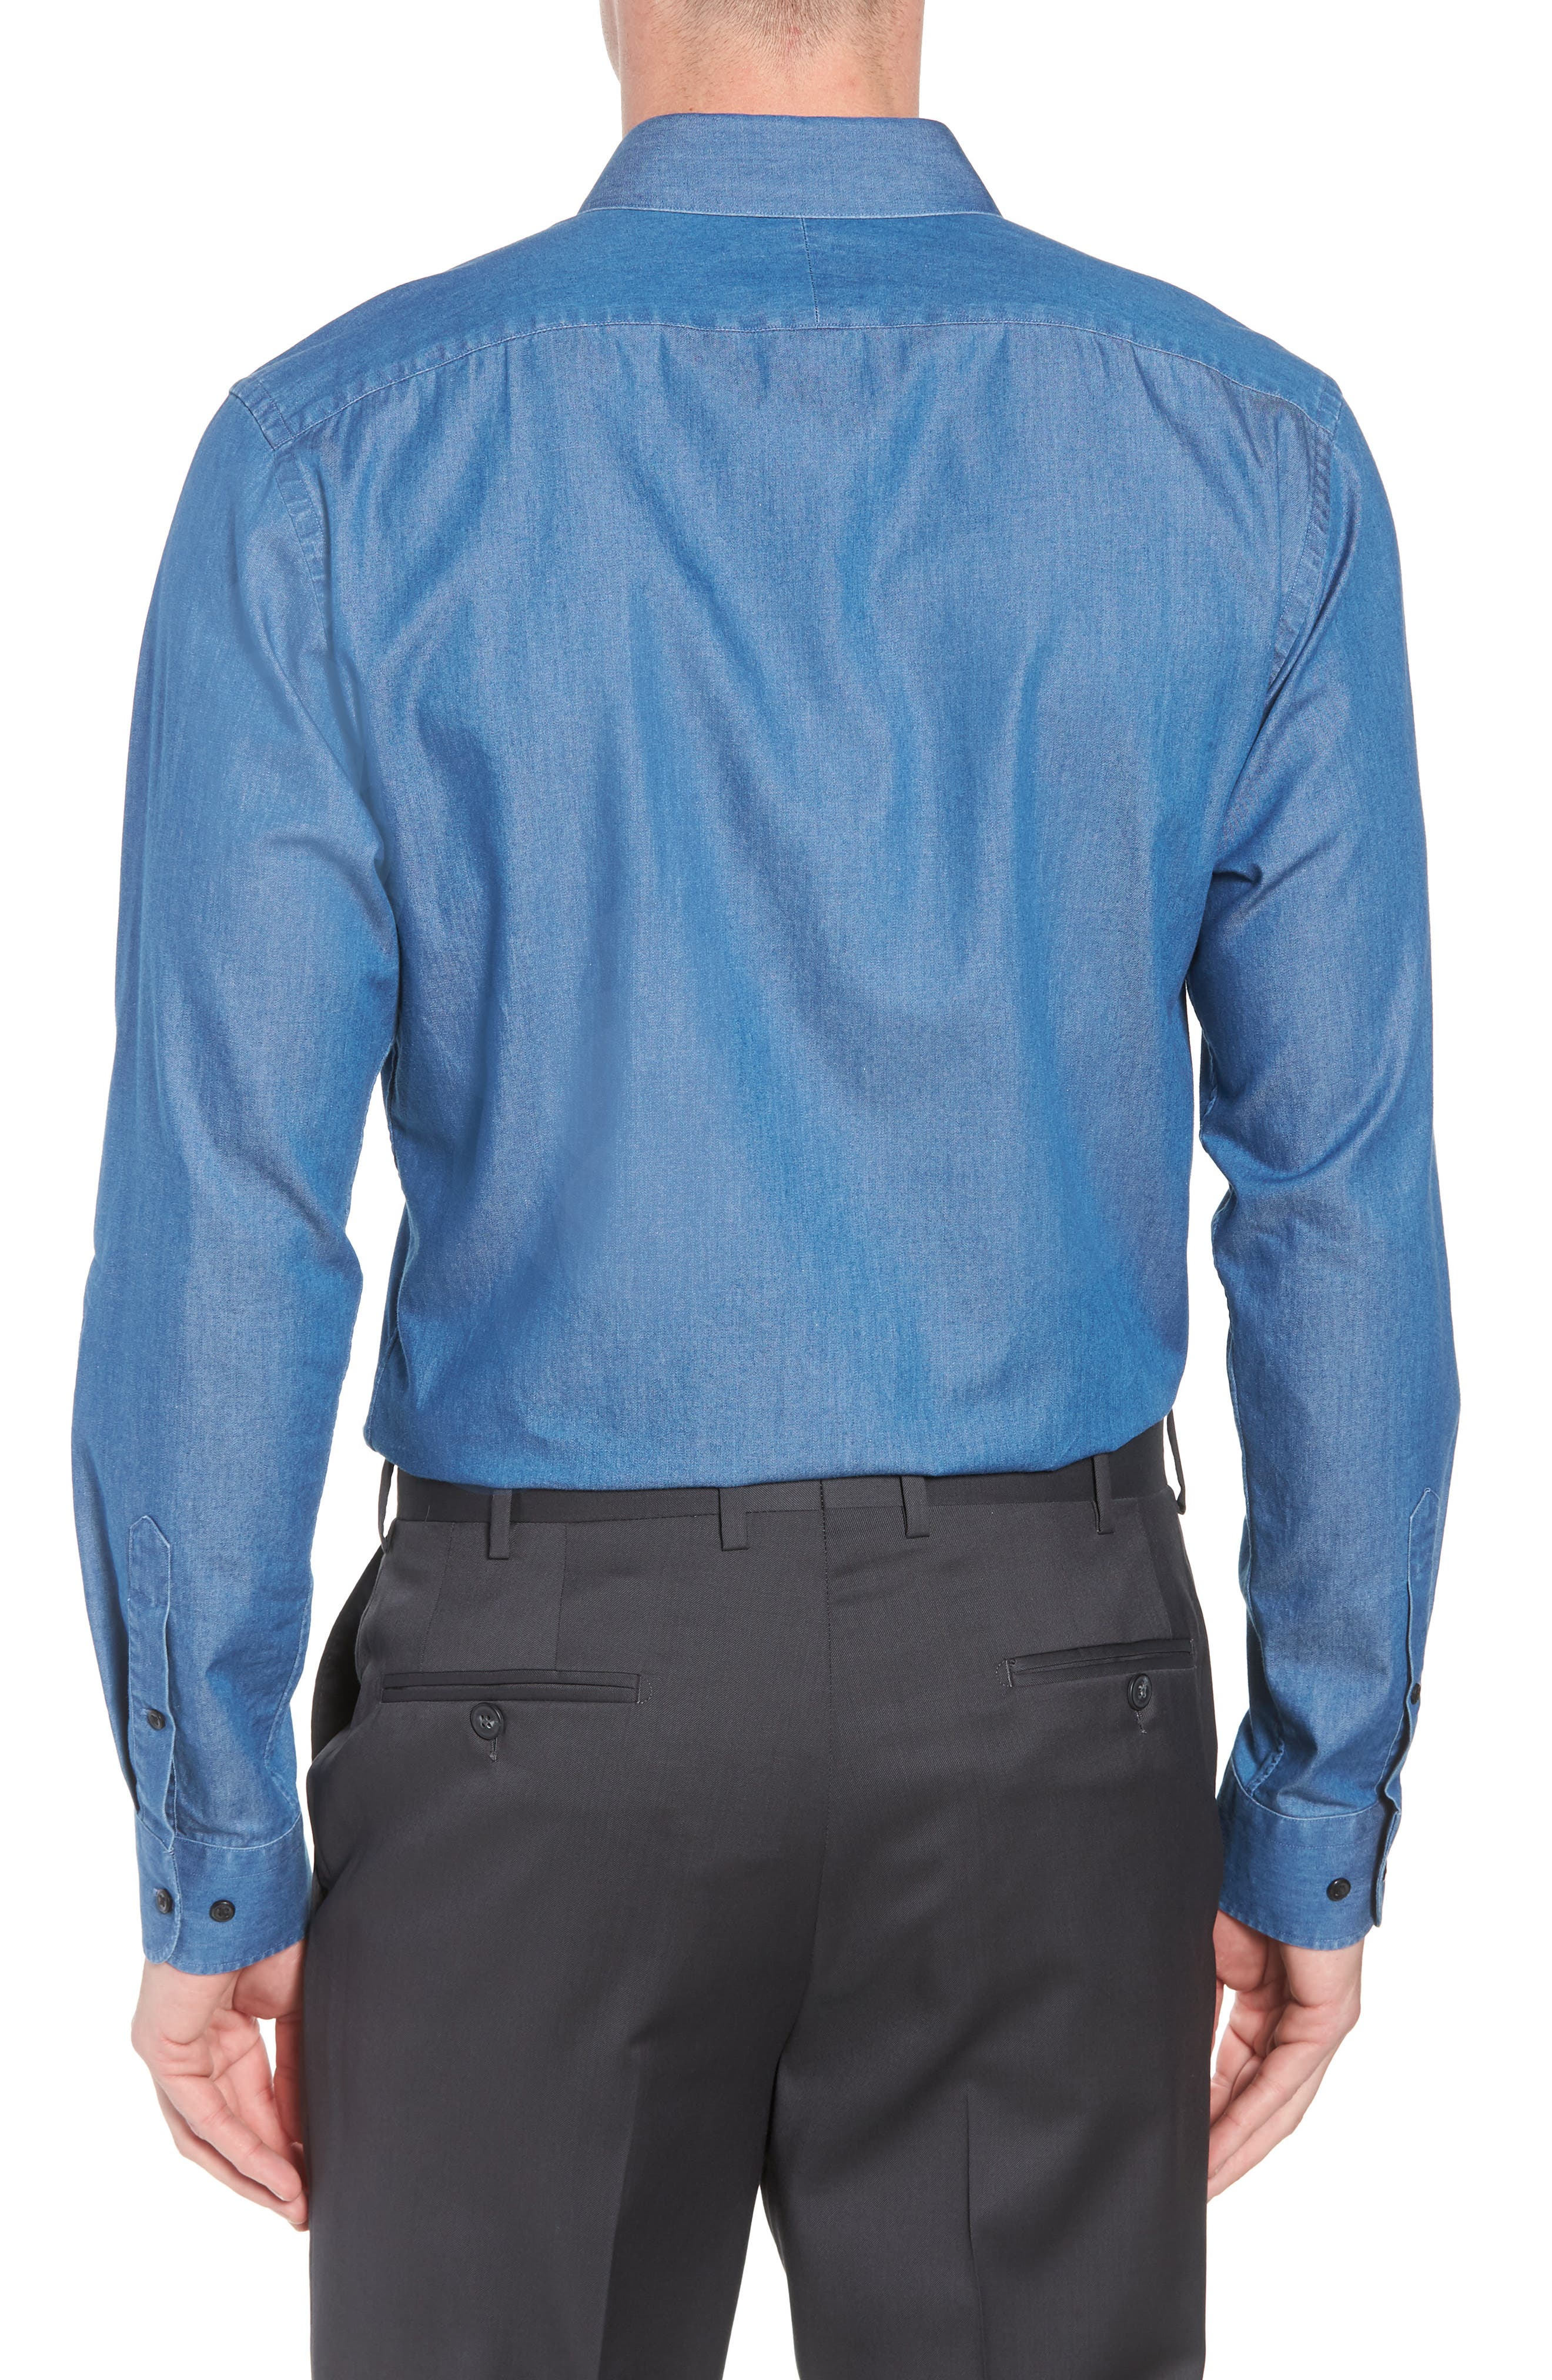 Trim Fit Solid Denim Dress Shirt,                             Alternate thumbnail 3, color,                             BLUE DENIM